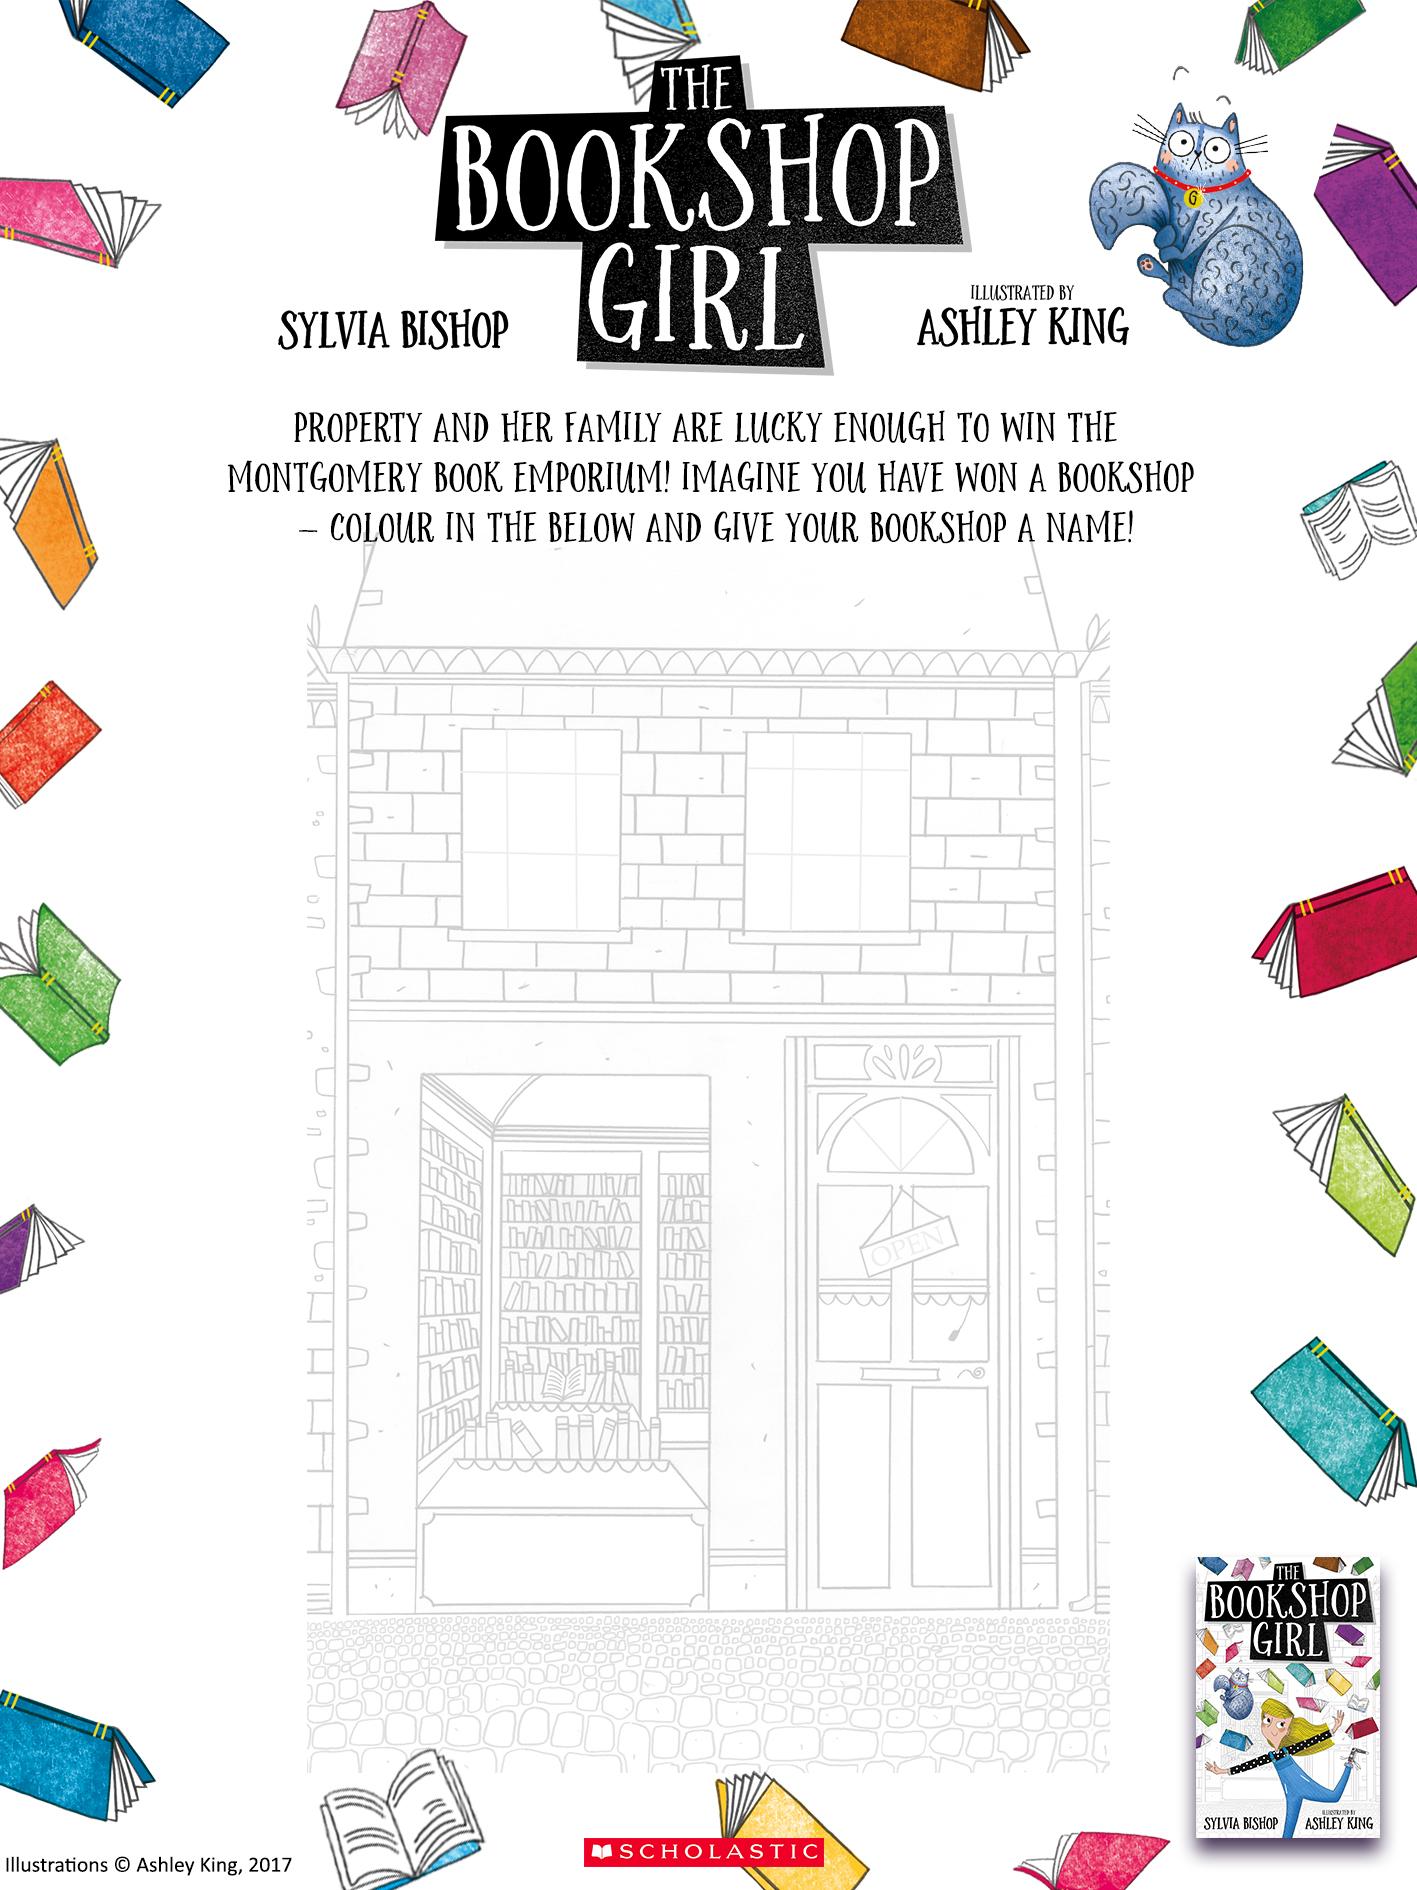 Bookshop girl activity 1 1600802